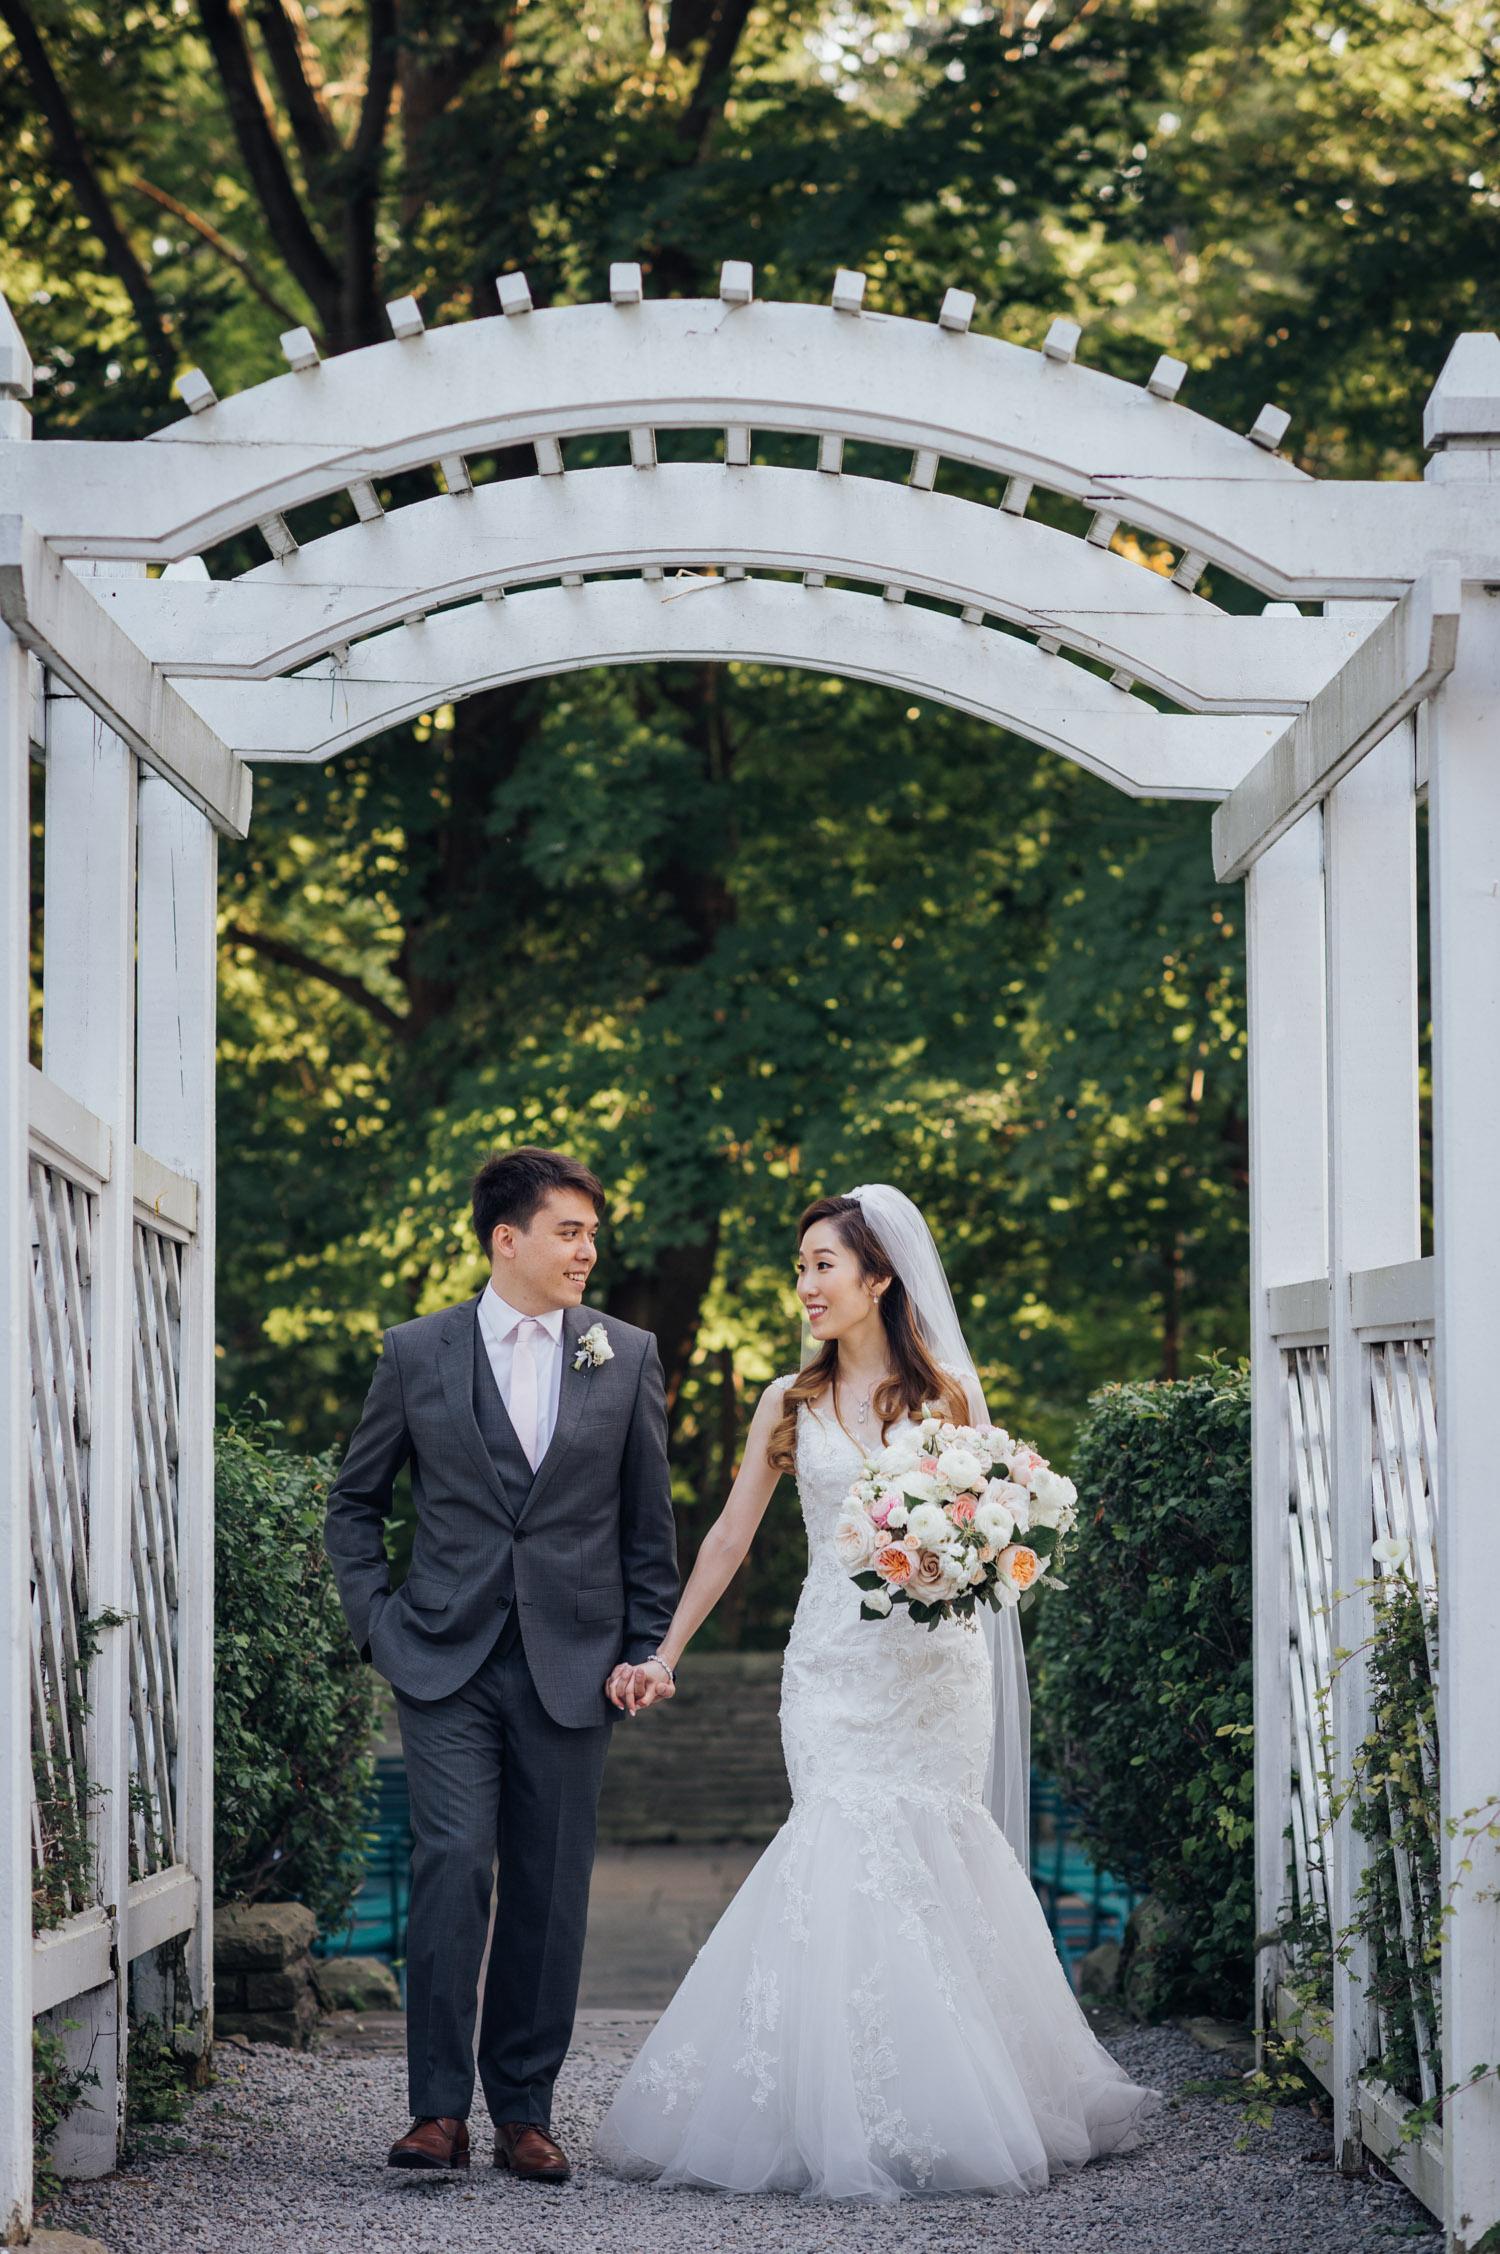 Toronto Outdoor Wedding Ceremony Location at Vaughan Estate